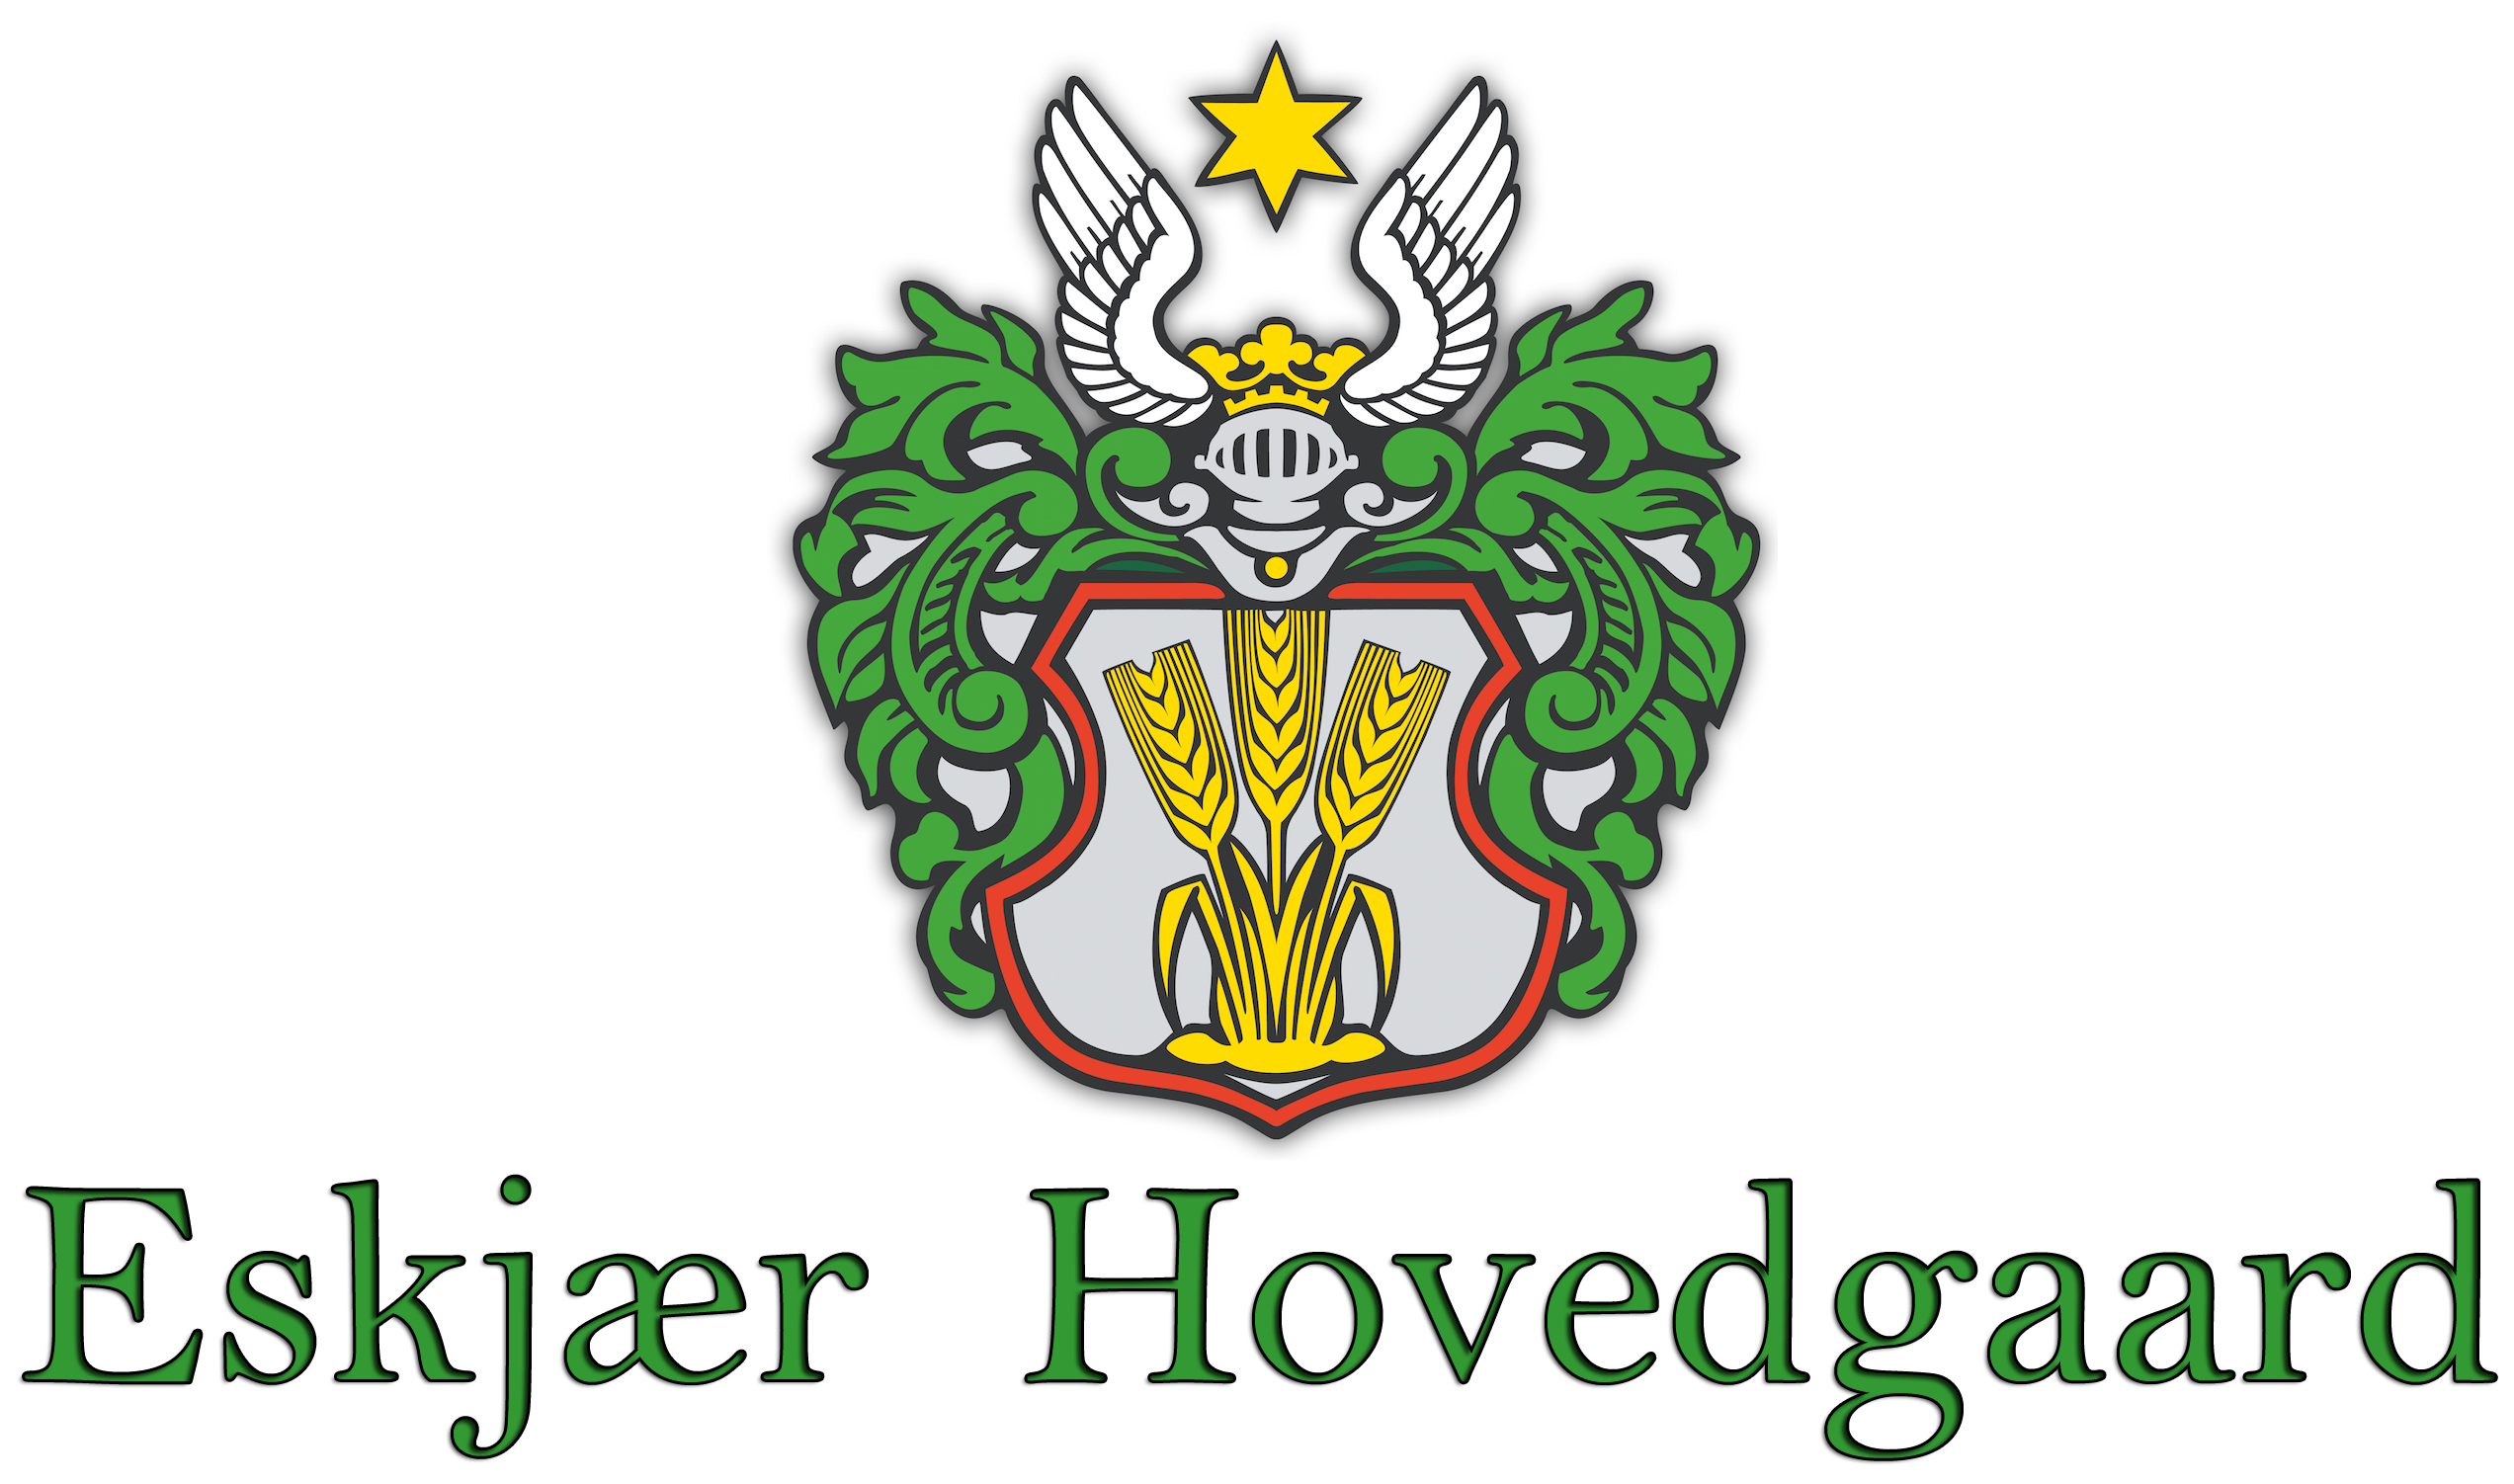 Eskjær Hovedgaard